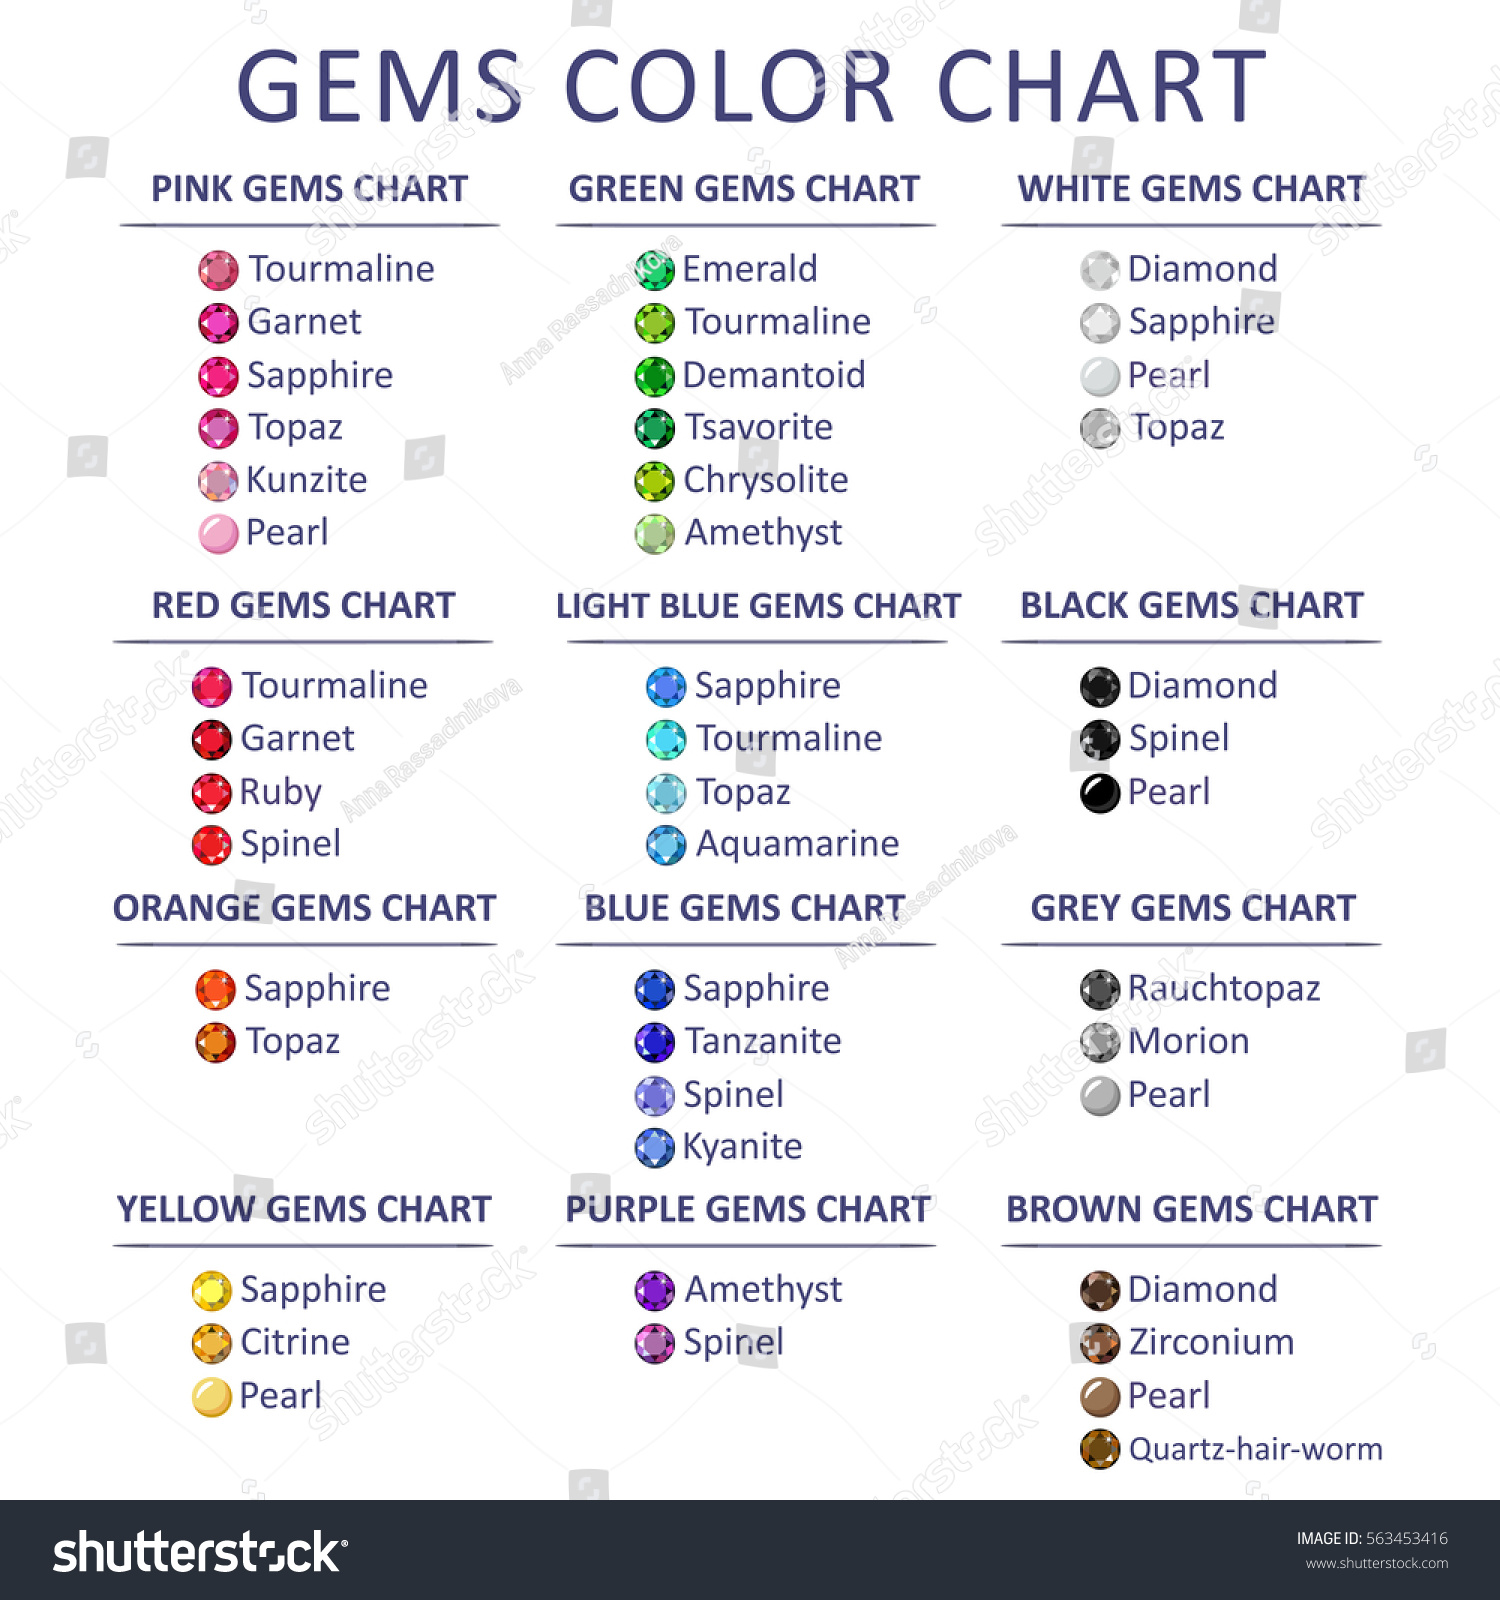 Low poly popular gems color graduation stock vector 563453416 low poly popular gems color graduation stock vector 563453416 shutterstock nvjuhfo Images